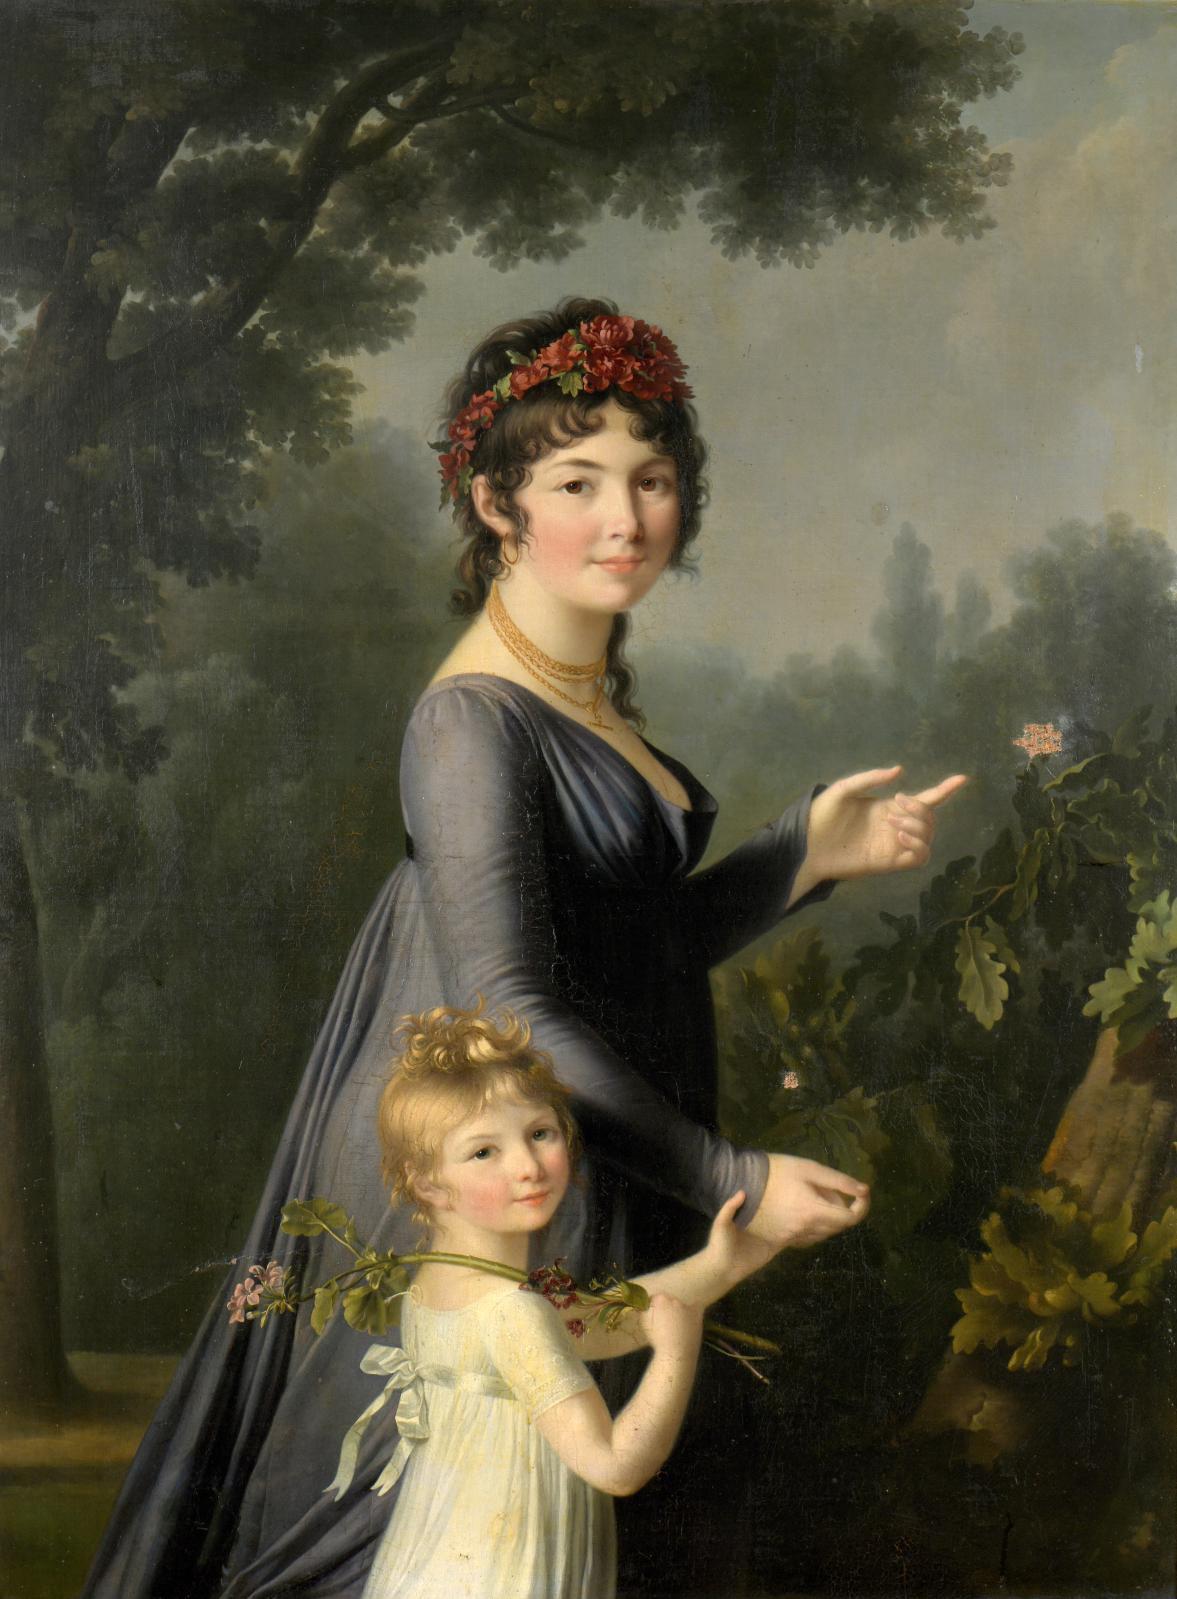 Marie-Victoire Lemoine (1754-1820), Presumed portrait of Marie-Geneviève Lemoine with her daughter Aglaé Deluchi, in a park, oil on canvas